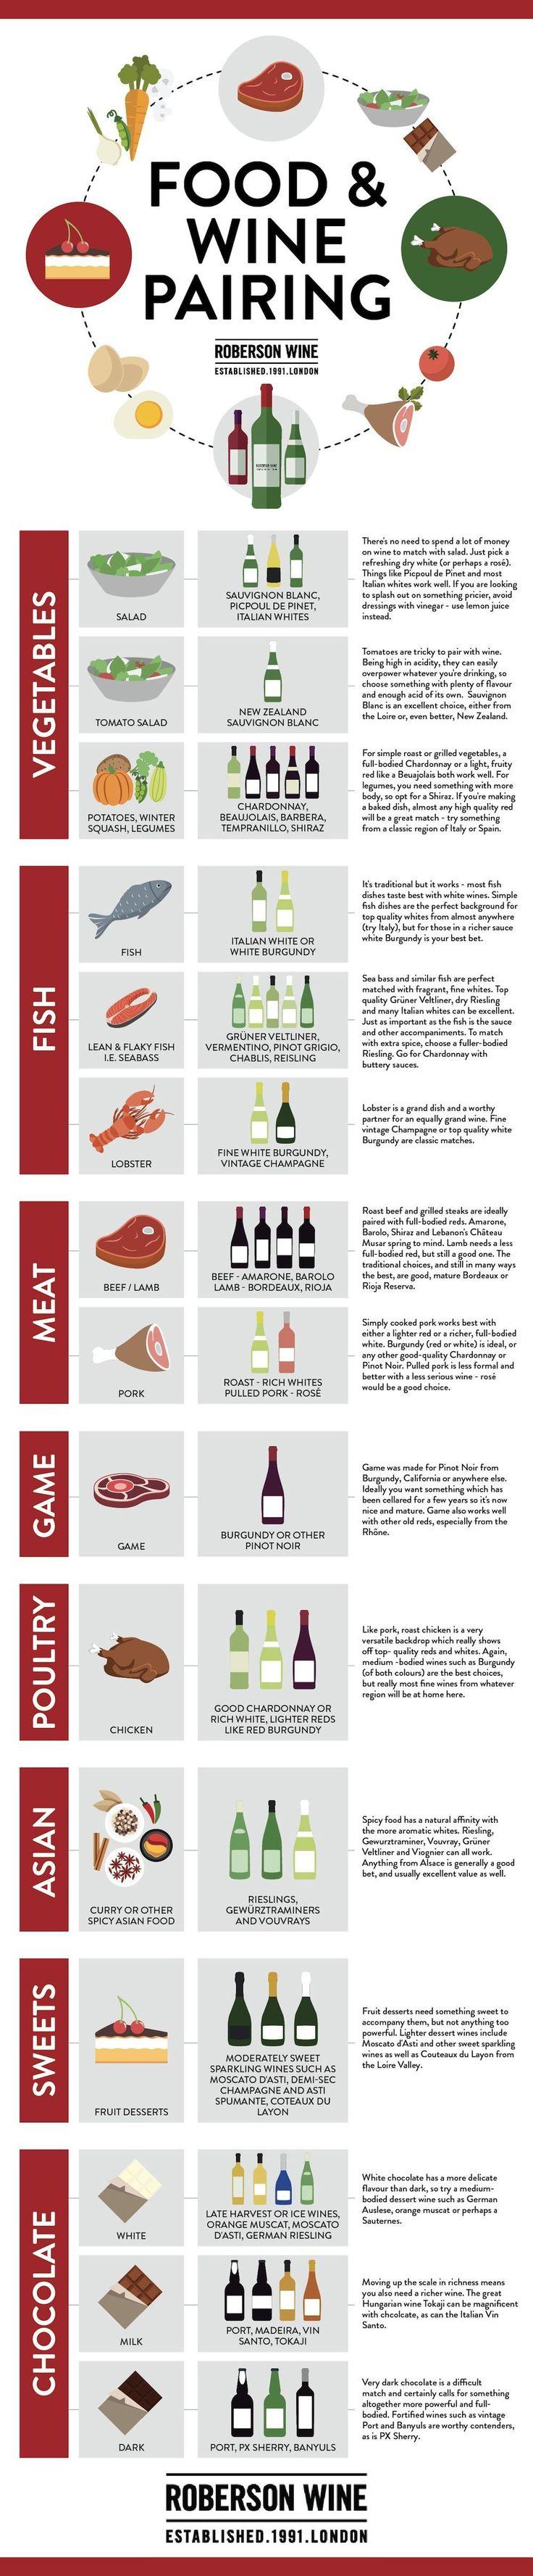 Wine infographic pairings